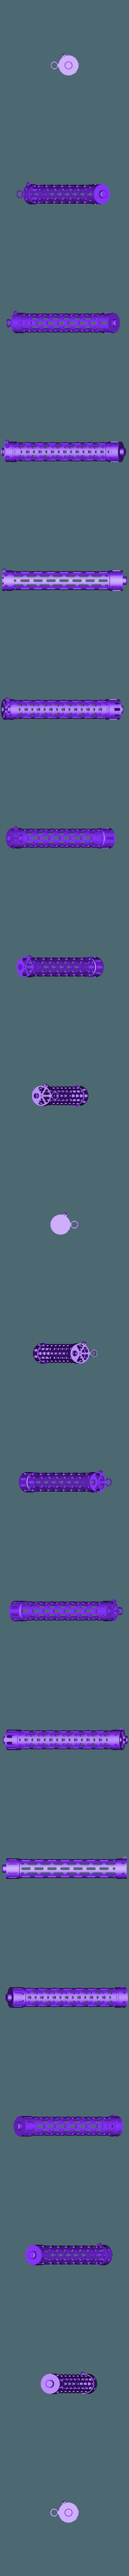 MG_Rohr.stl Download free STL file Machine Gun Spandau MG08 • 3D print object, wersy